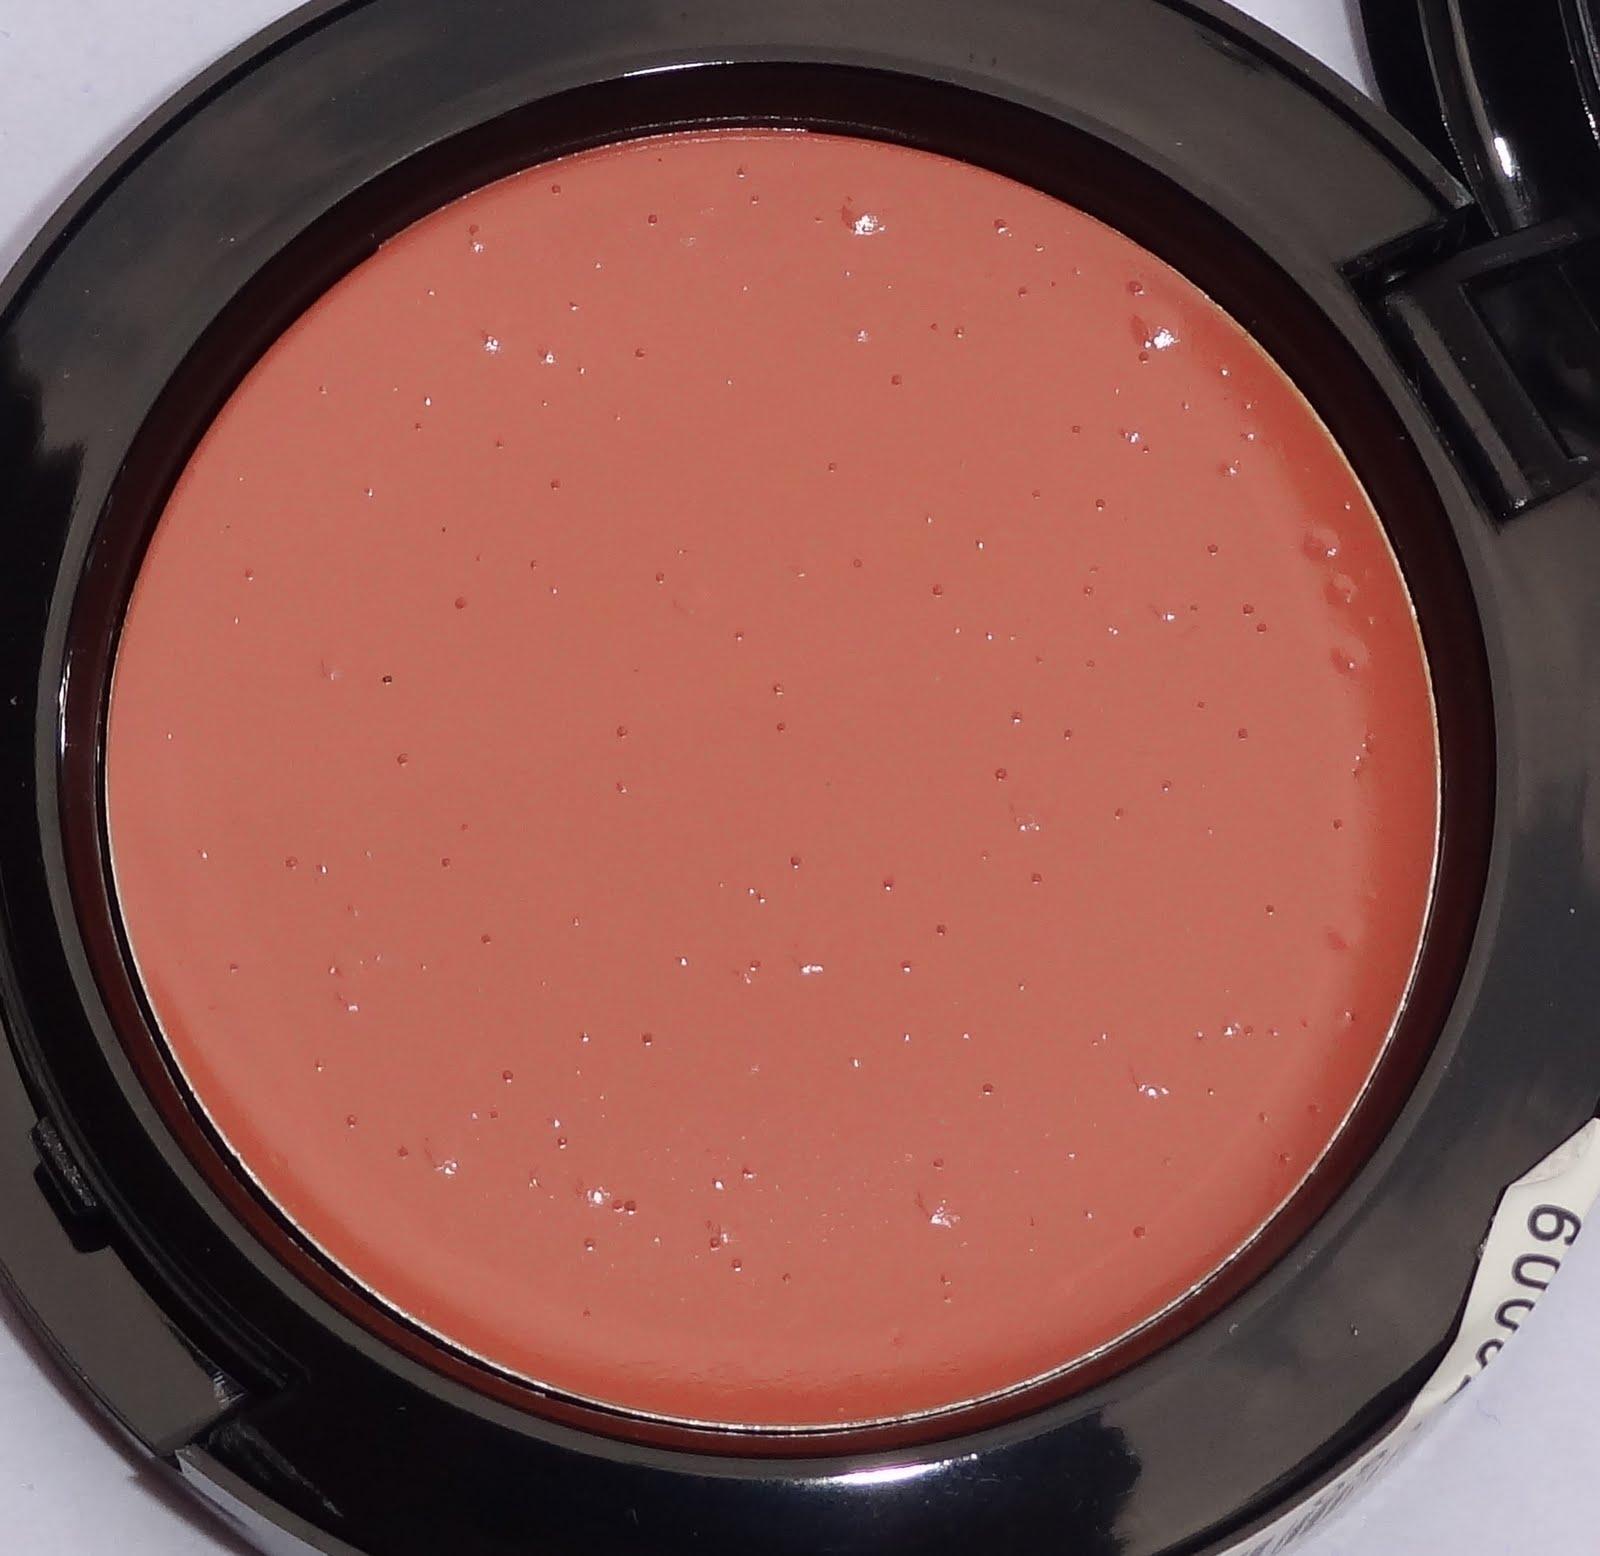 Nyx Tea Rose Cream Blush Swatches Review Peachesandblush